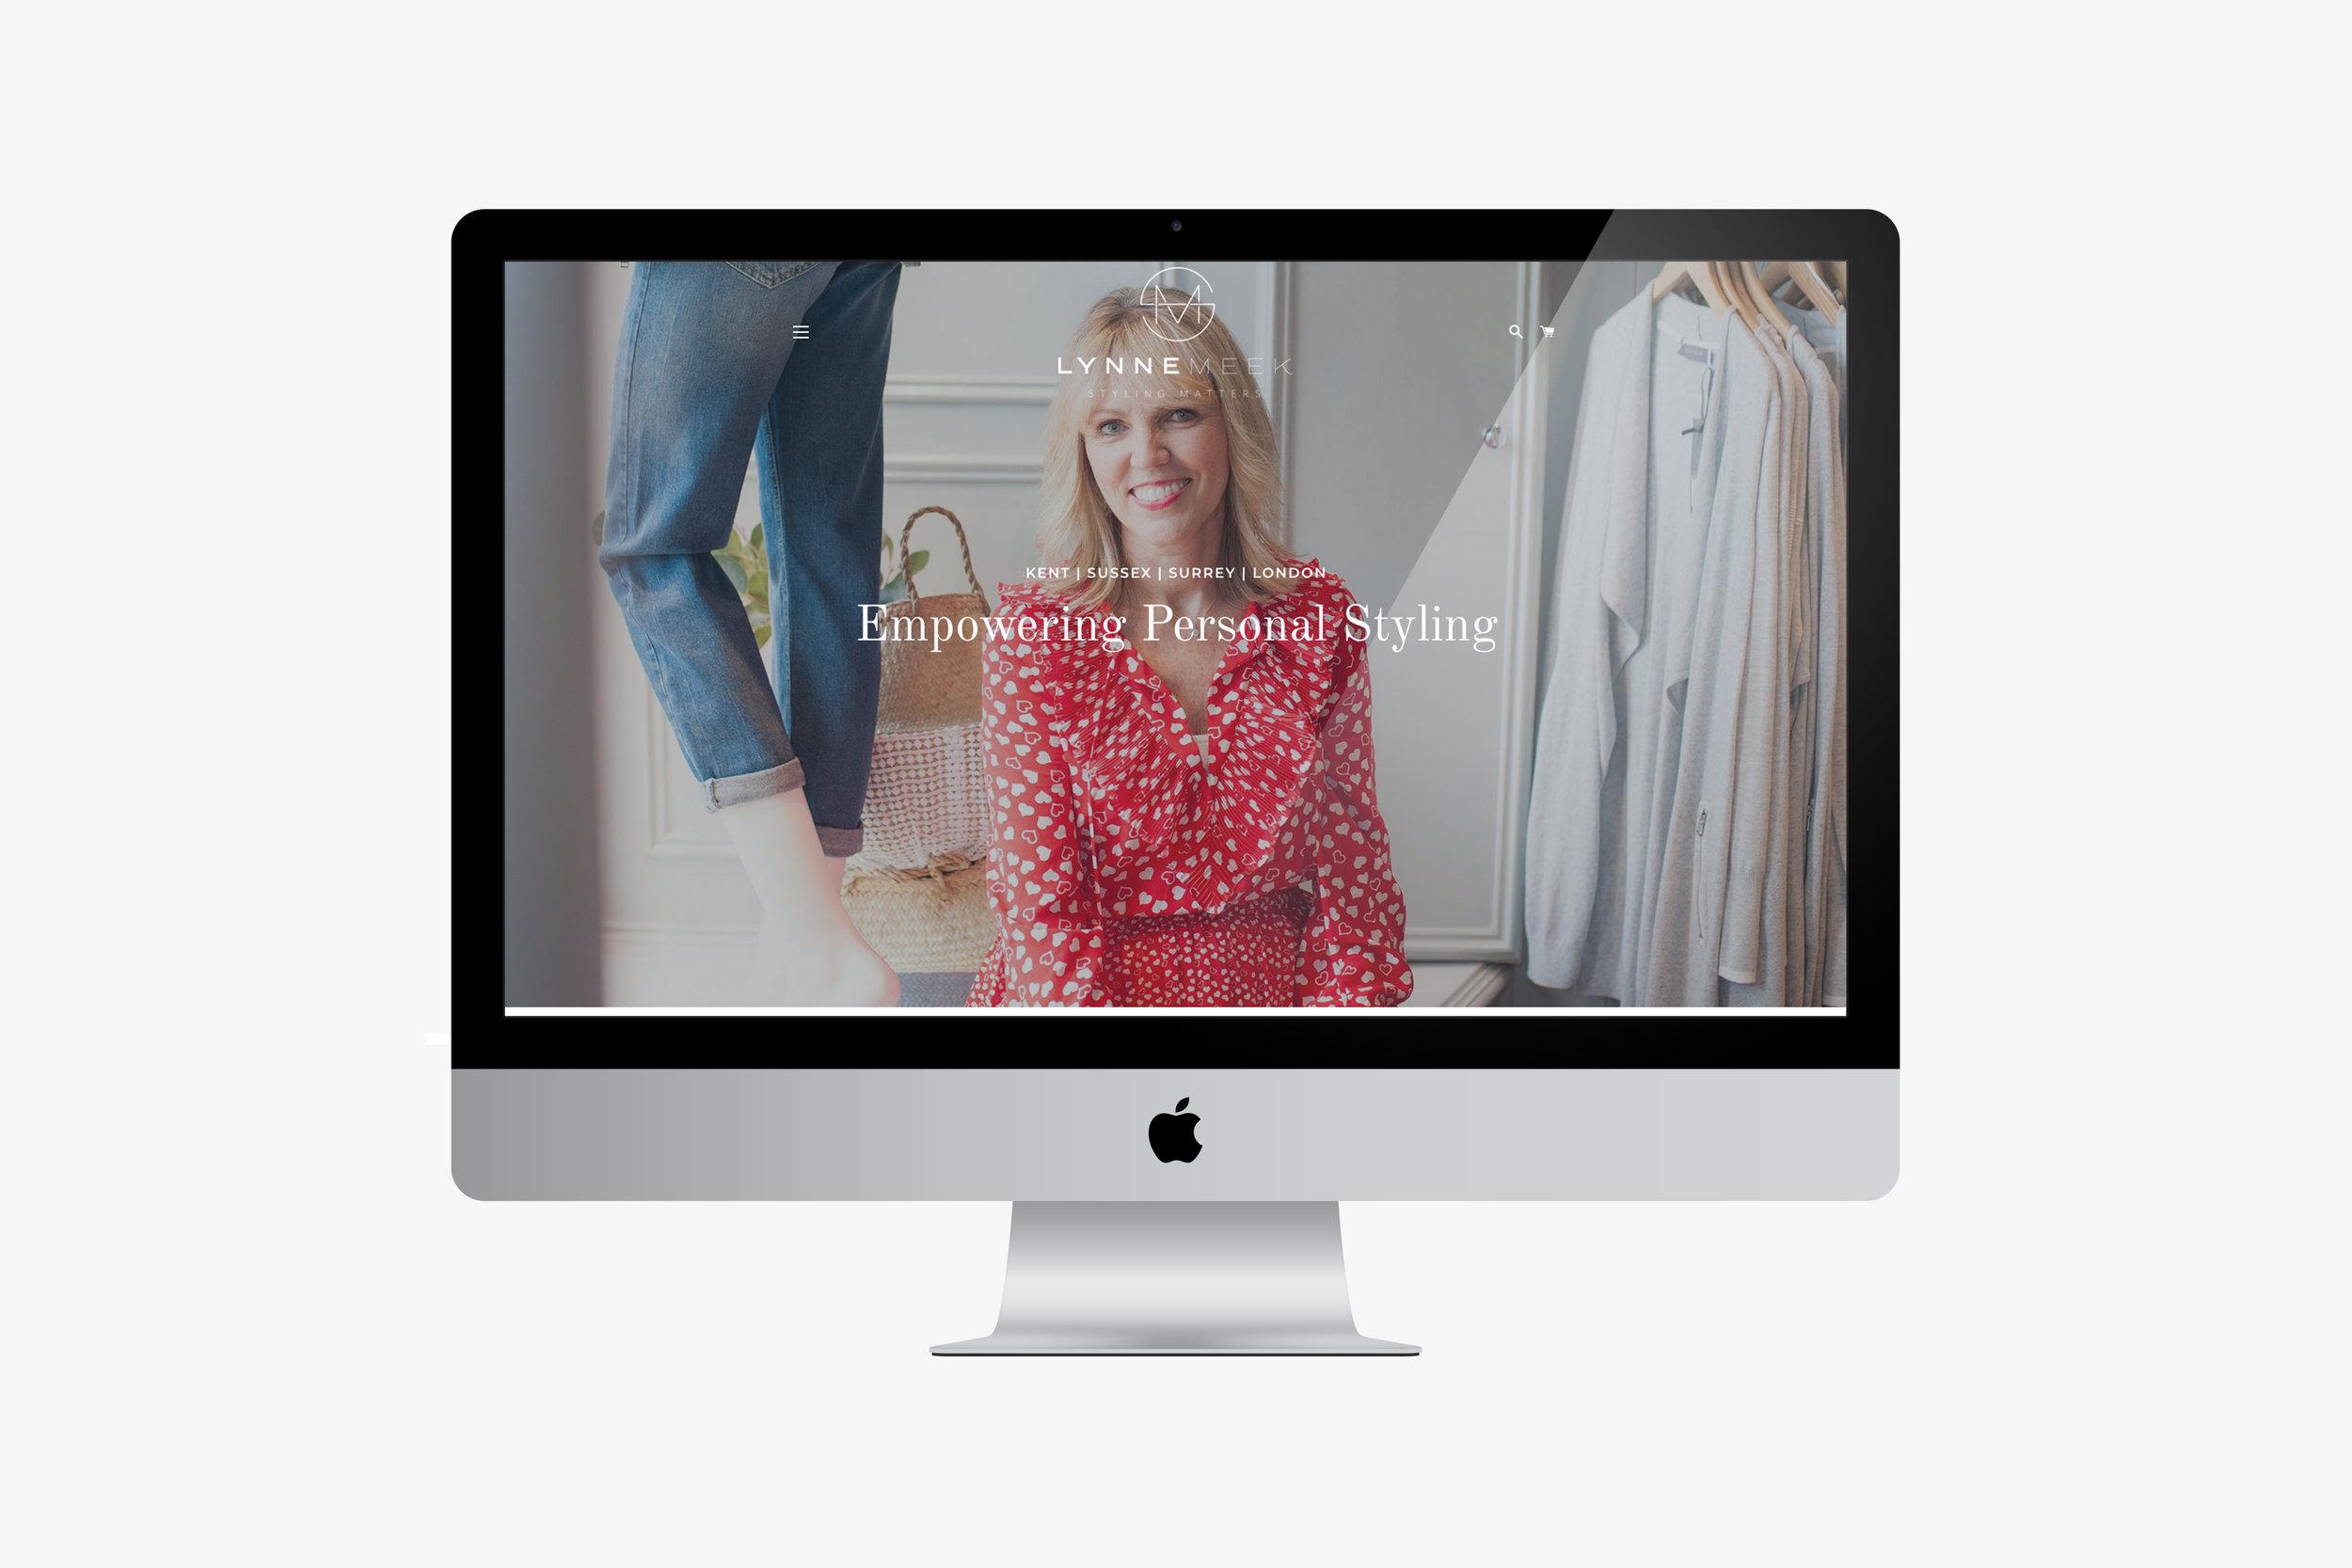 Brand design agency for Styling Matters, Tunbridge Wells based business